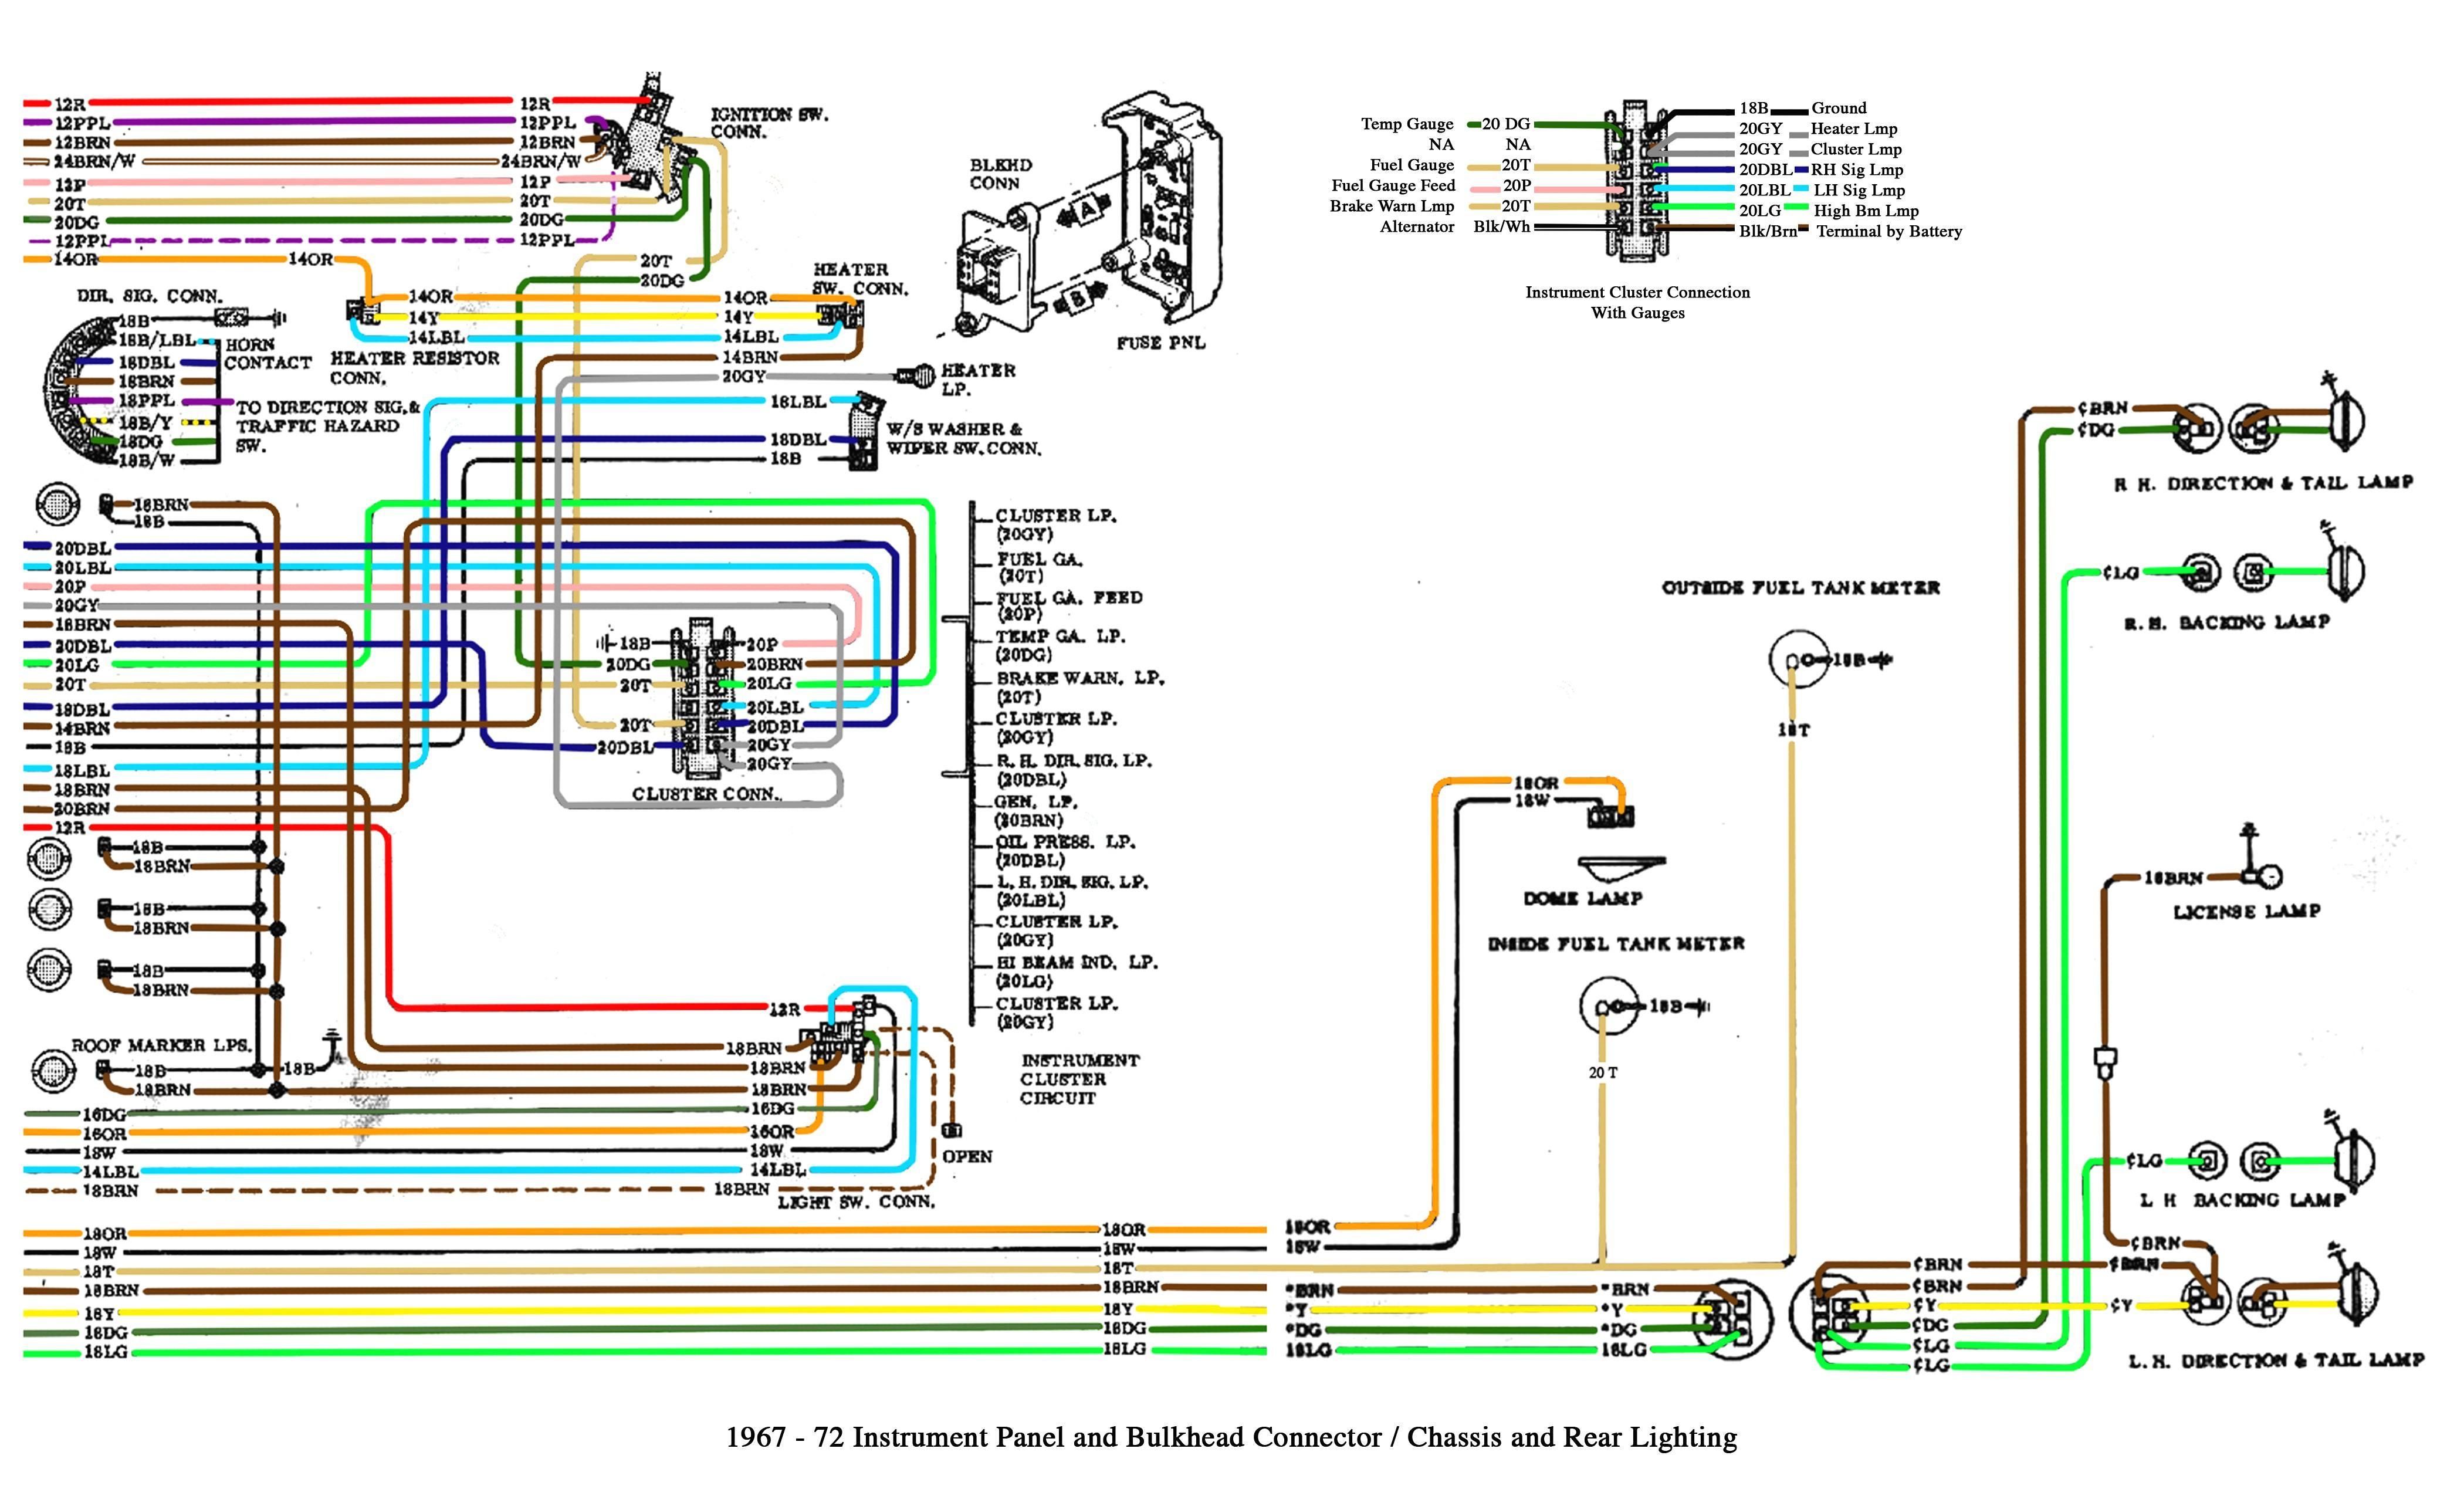 2003 Chevy Suburban Trailer Wiring Diagram Tamahuproject Org